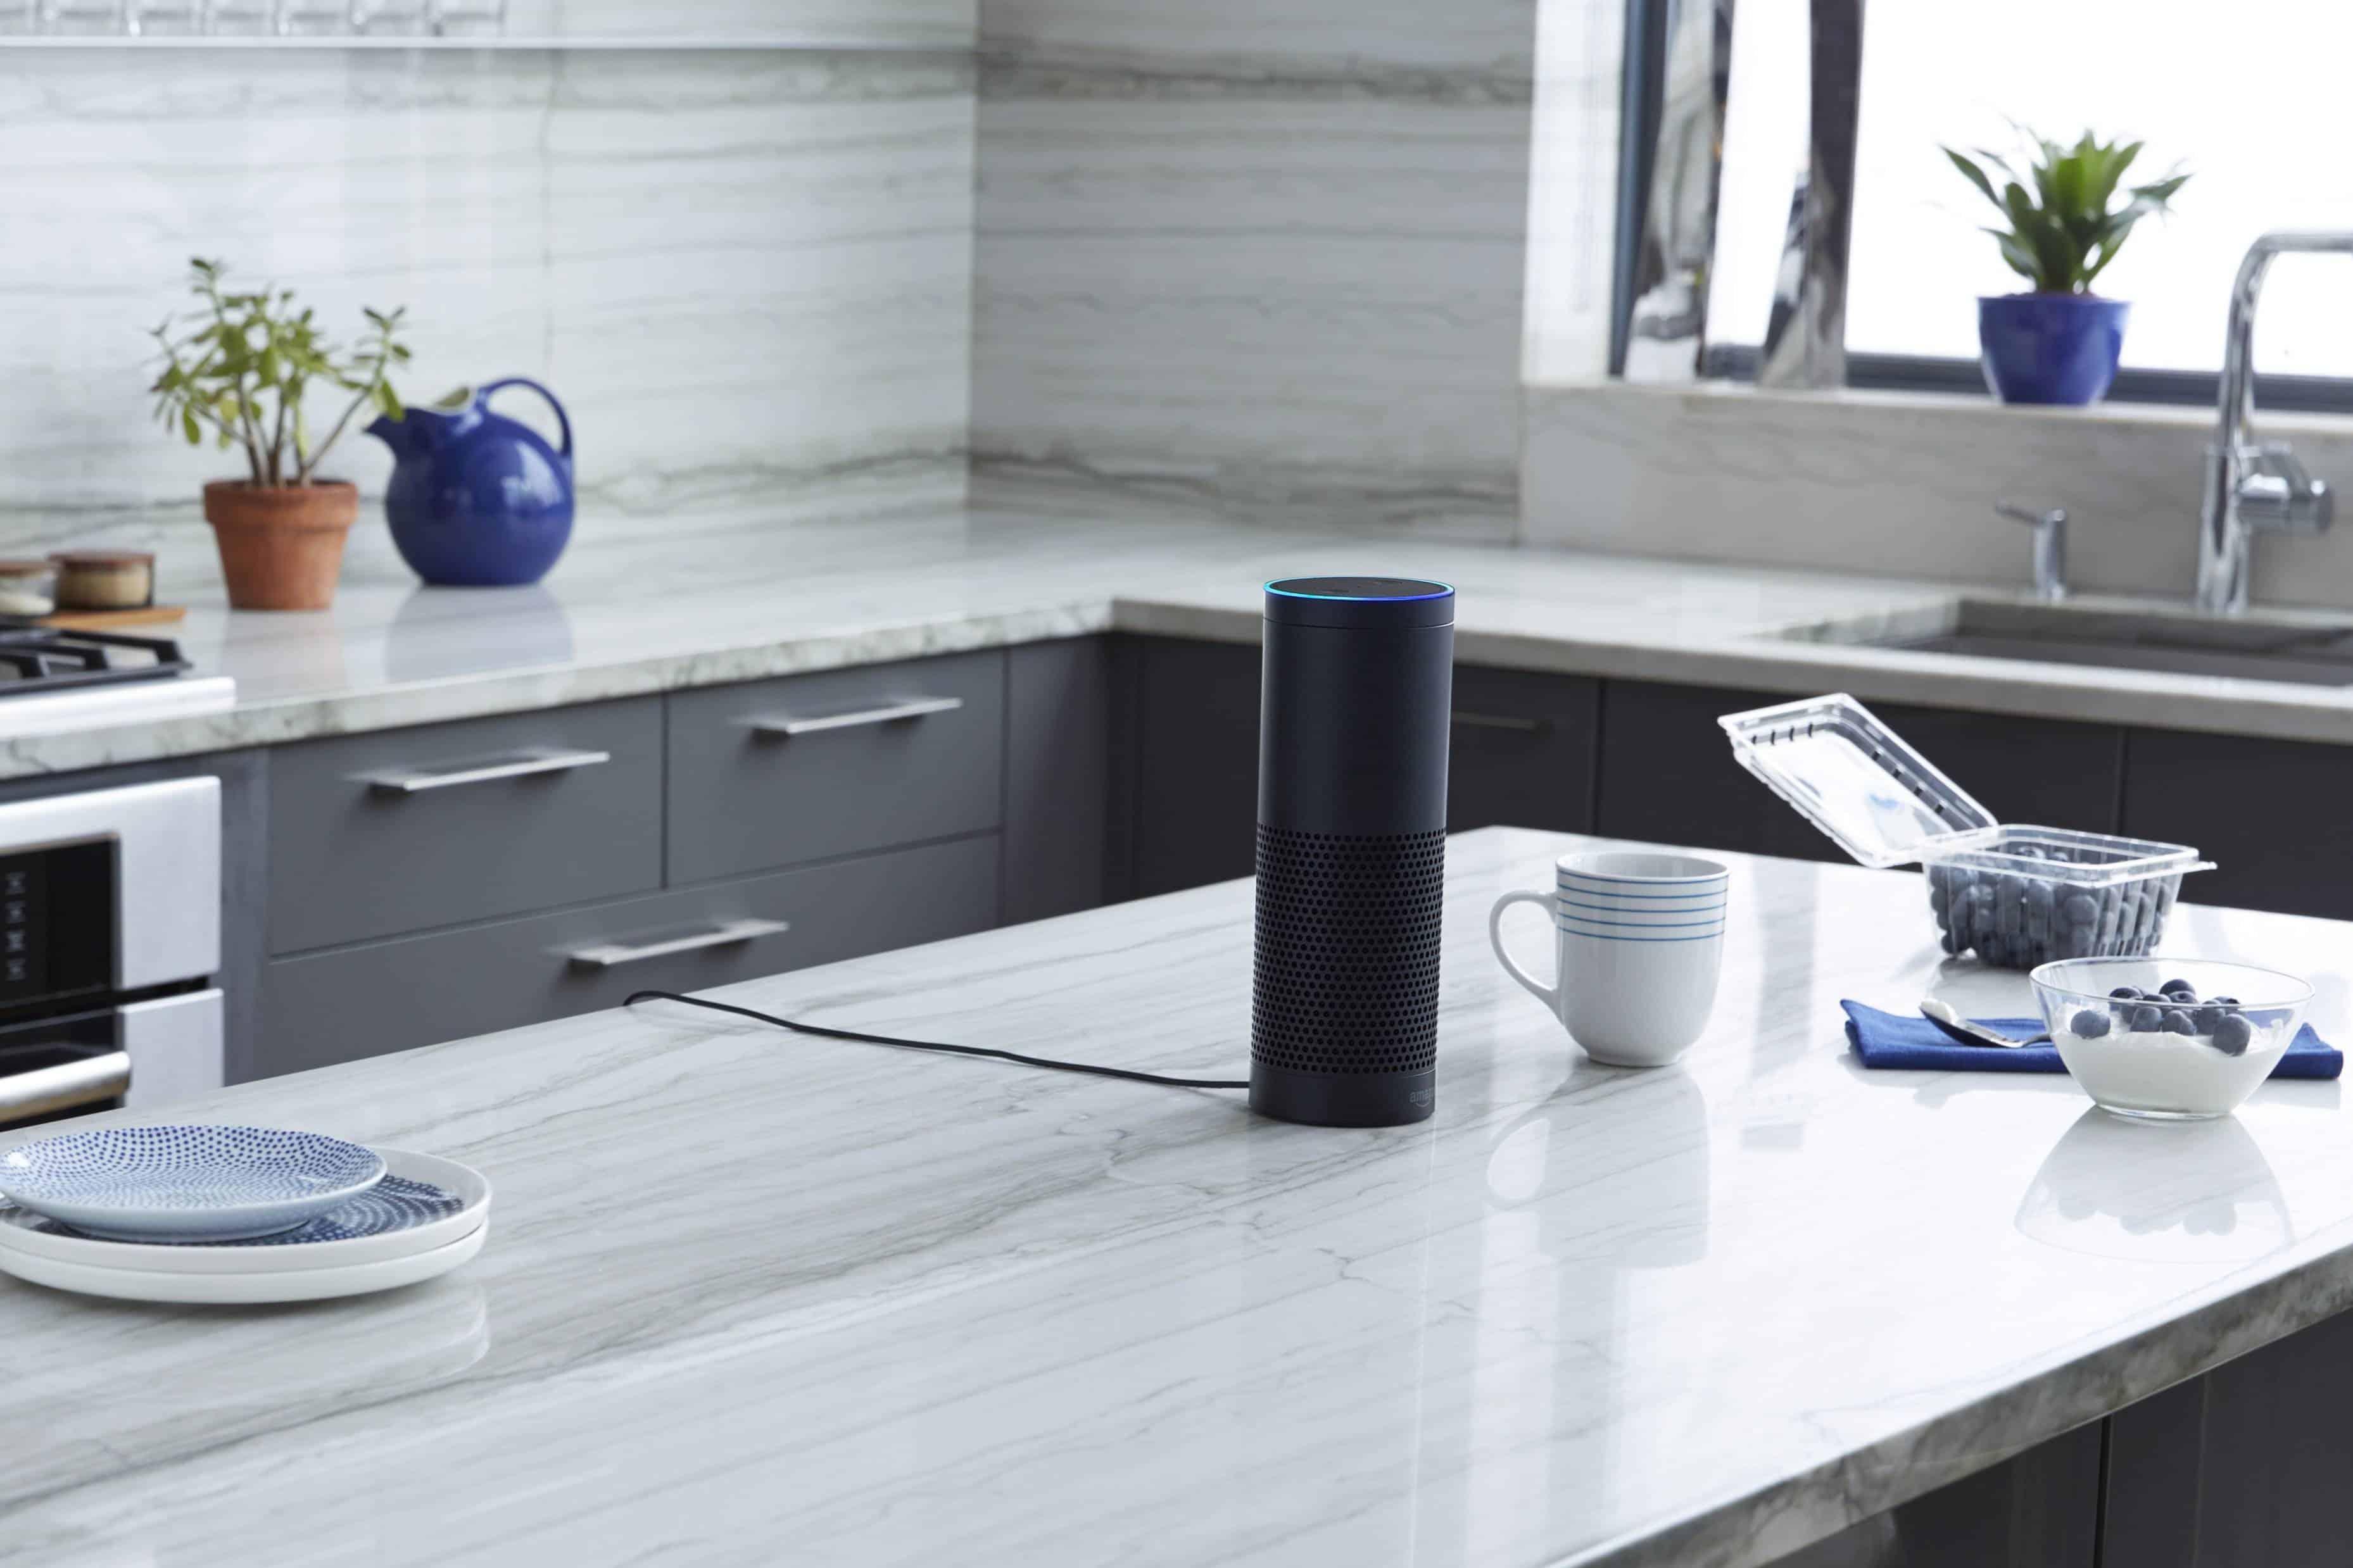 Deal: Amazon Echo & Echo Dot Discounted with Promo Code - 5/29/17 ...